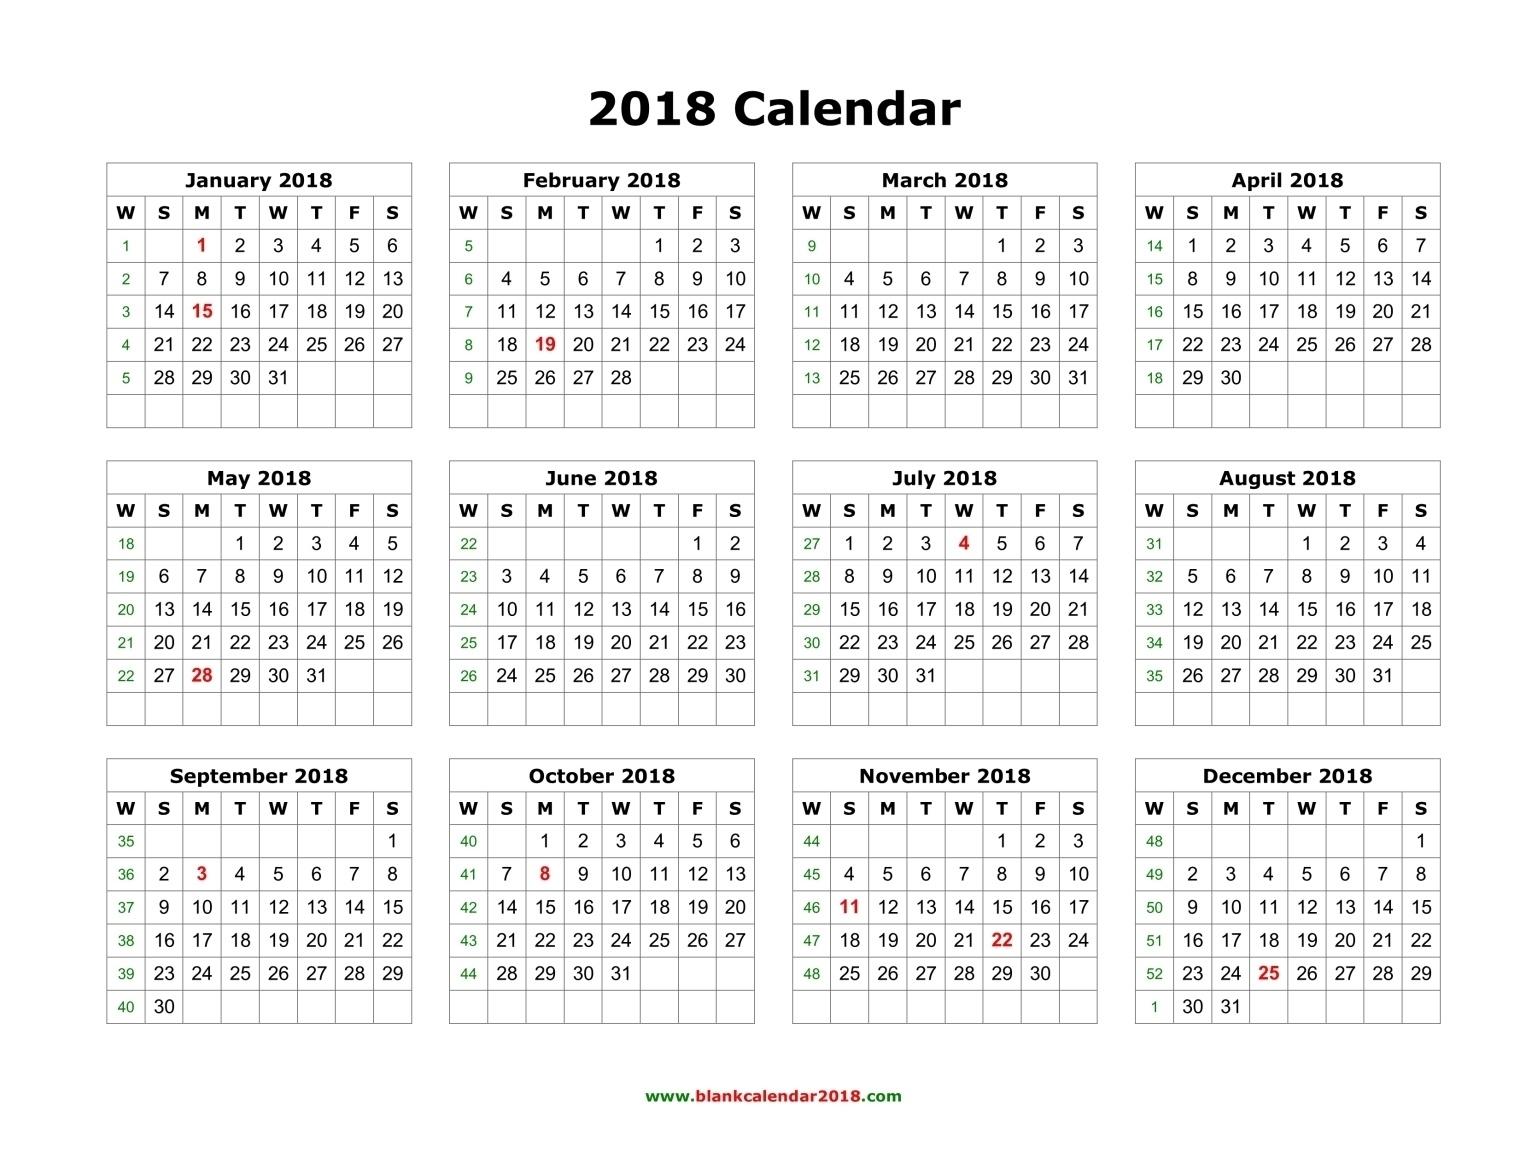 Blank Calendar 2018  Blank Calendar Template With Notes